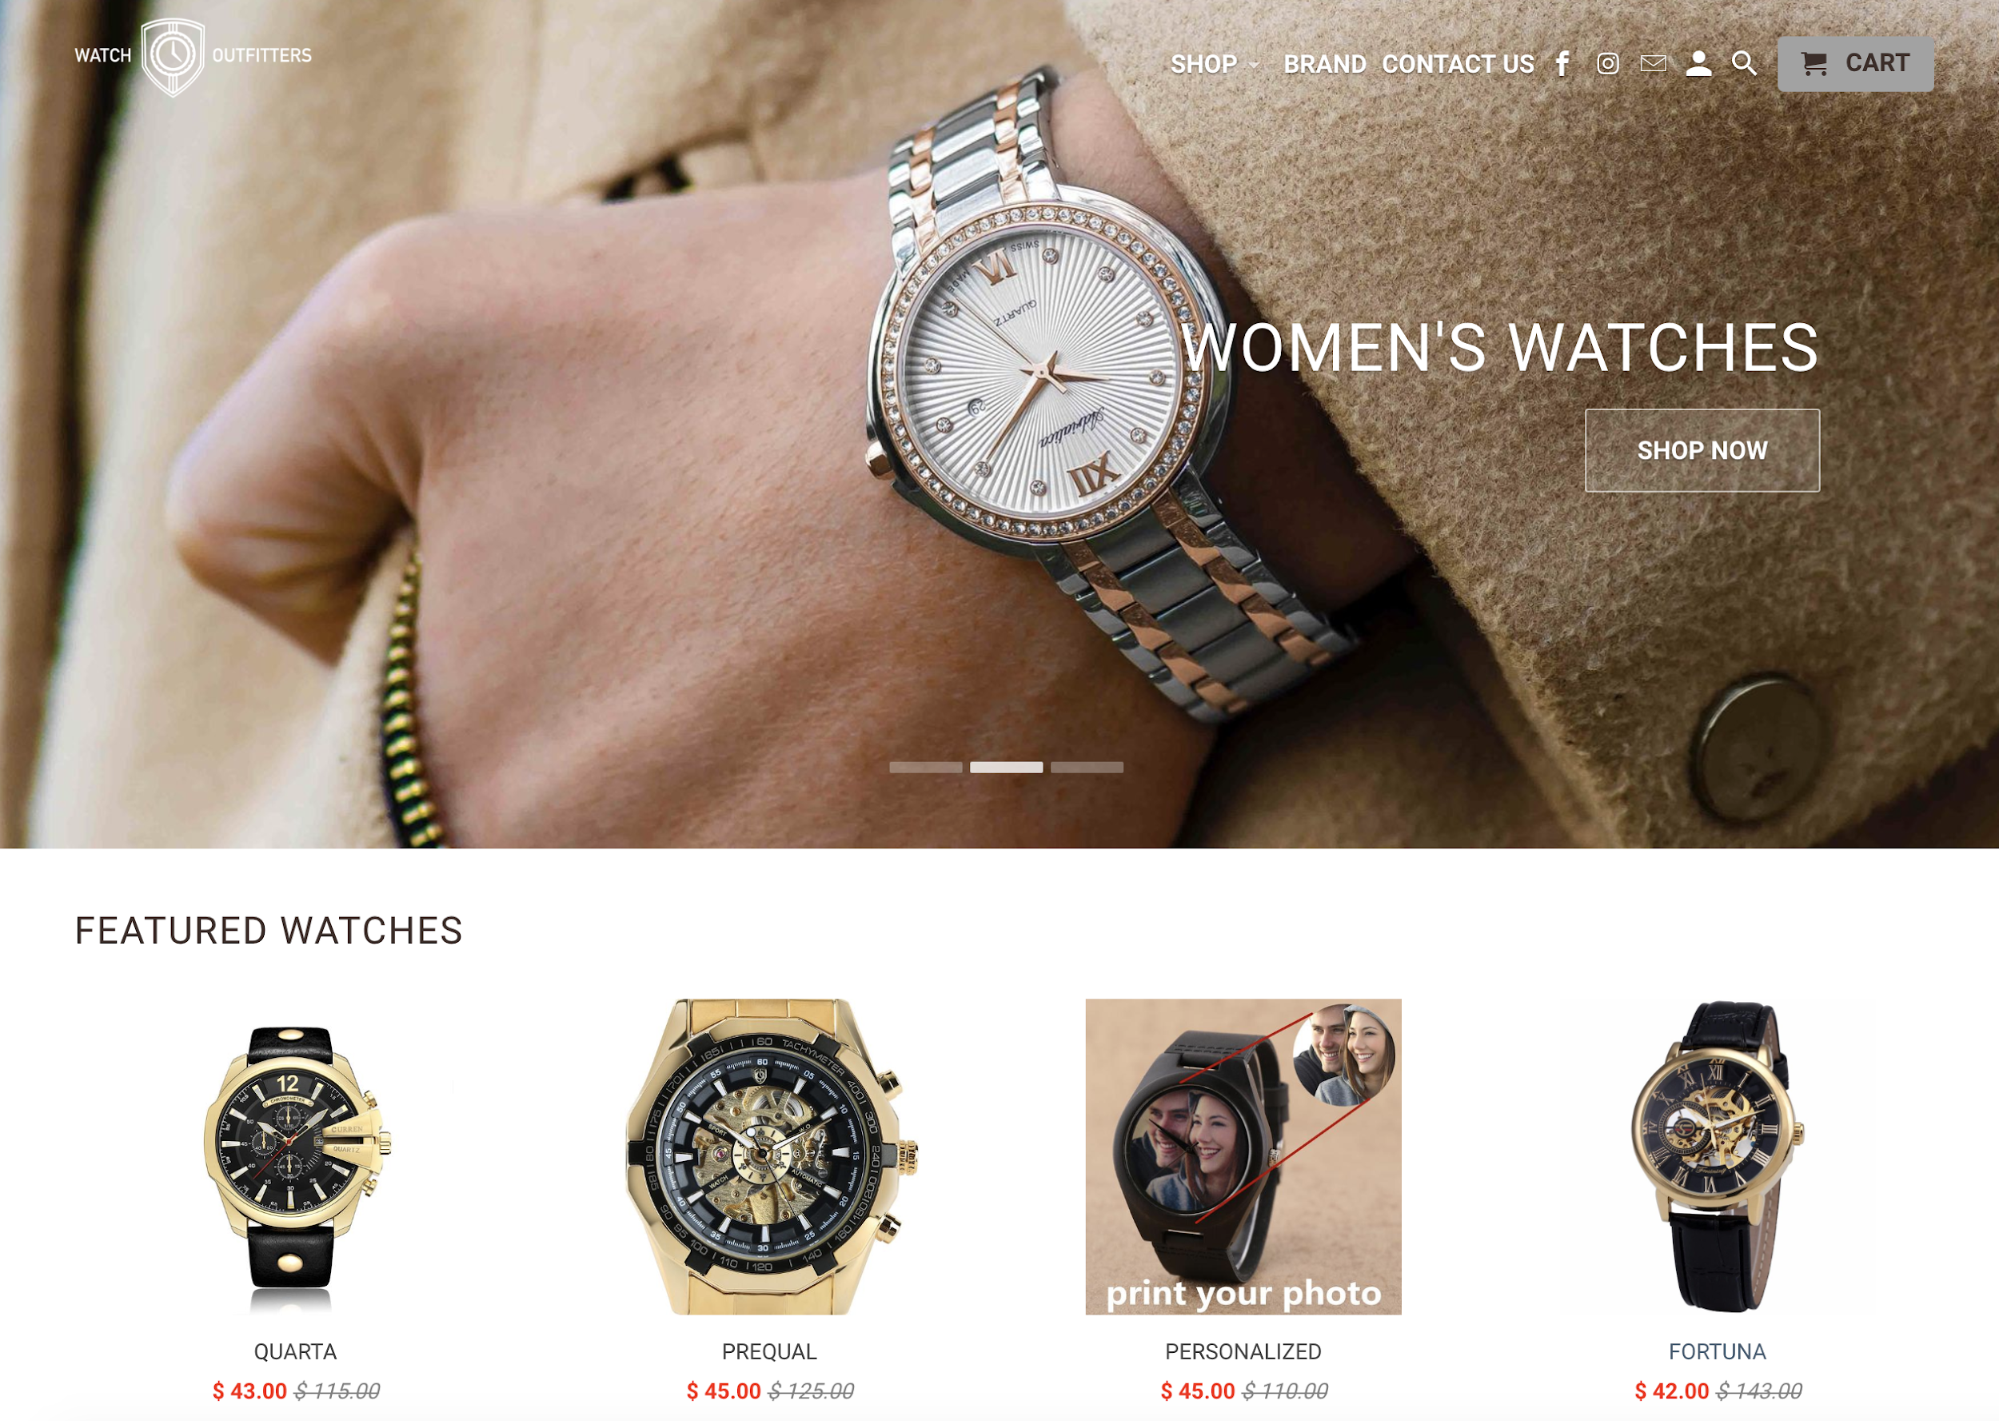 Screenshot showing a store that sells women